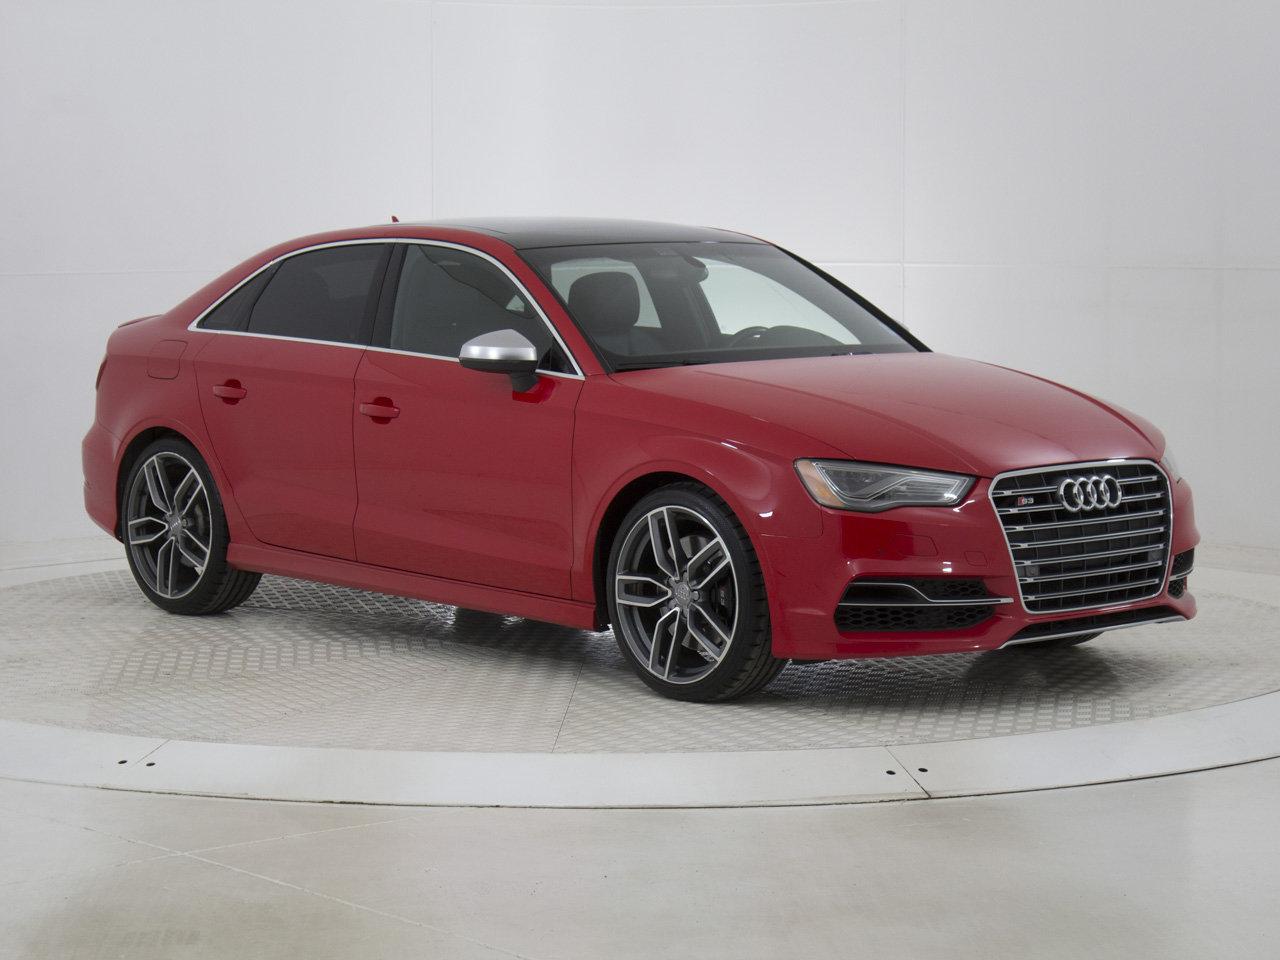 2015 Audi A3/S3 2.0T Technik